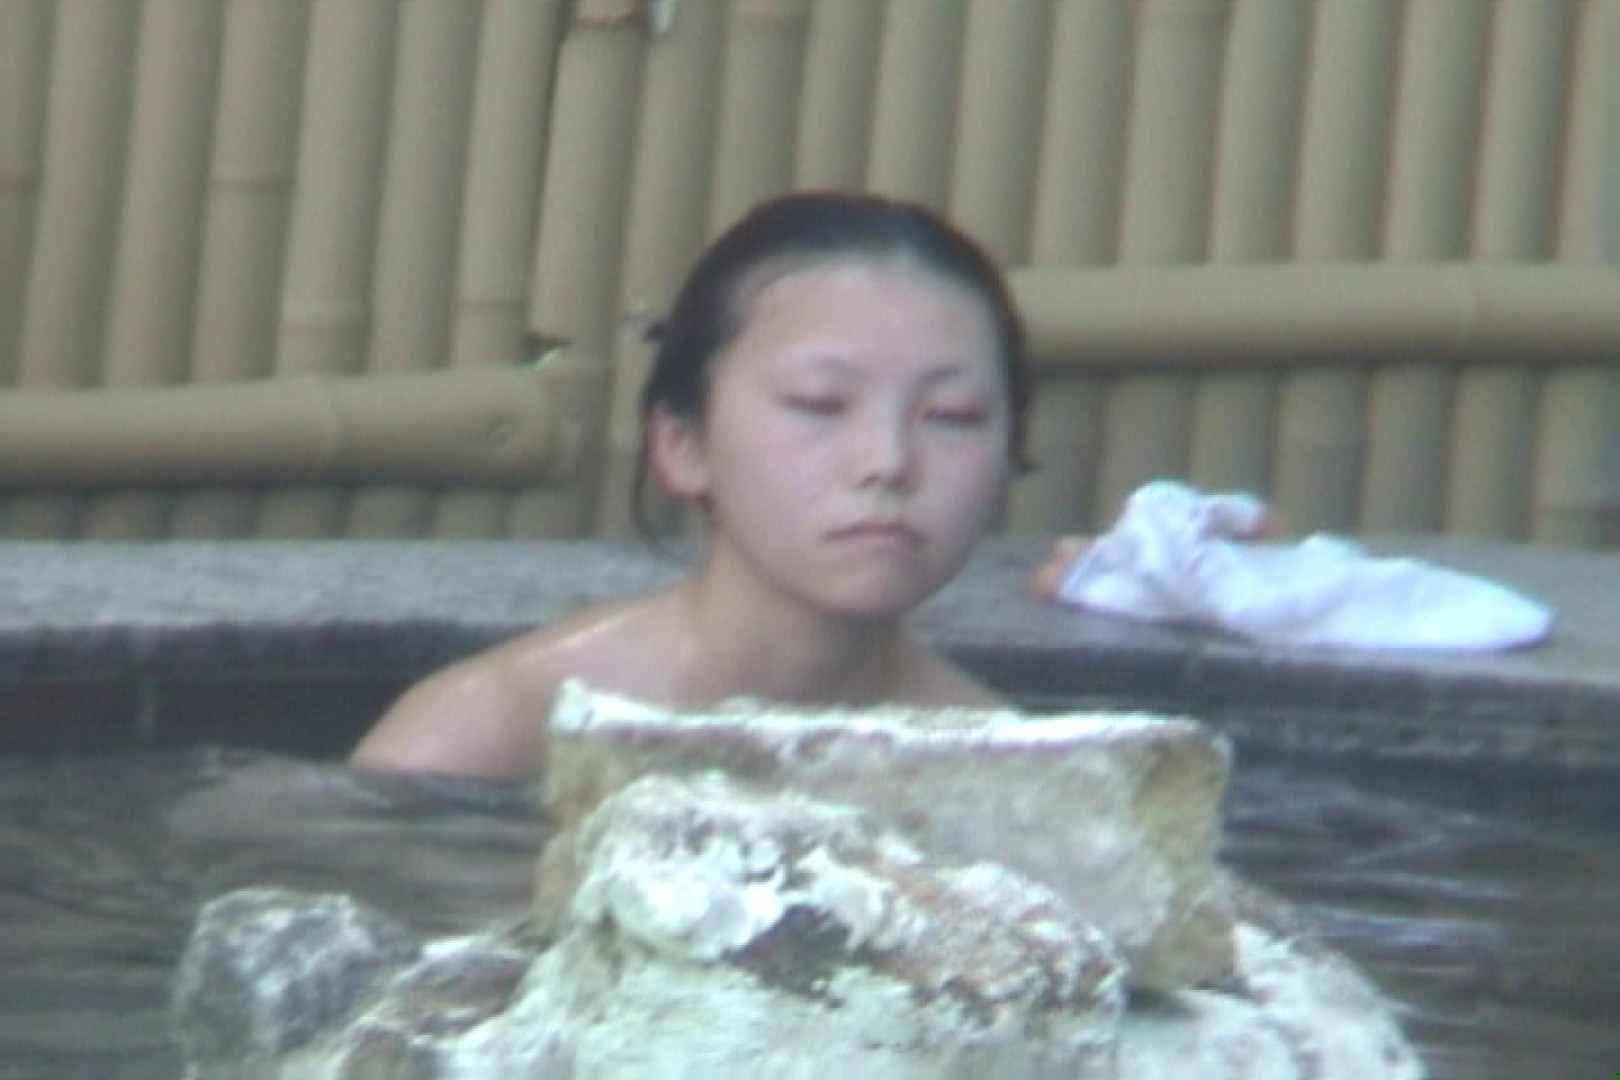 Aquaな露天風呂Vol.572 盗撮 | OLエロ画像  67PICs 10